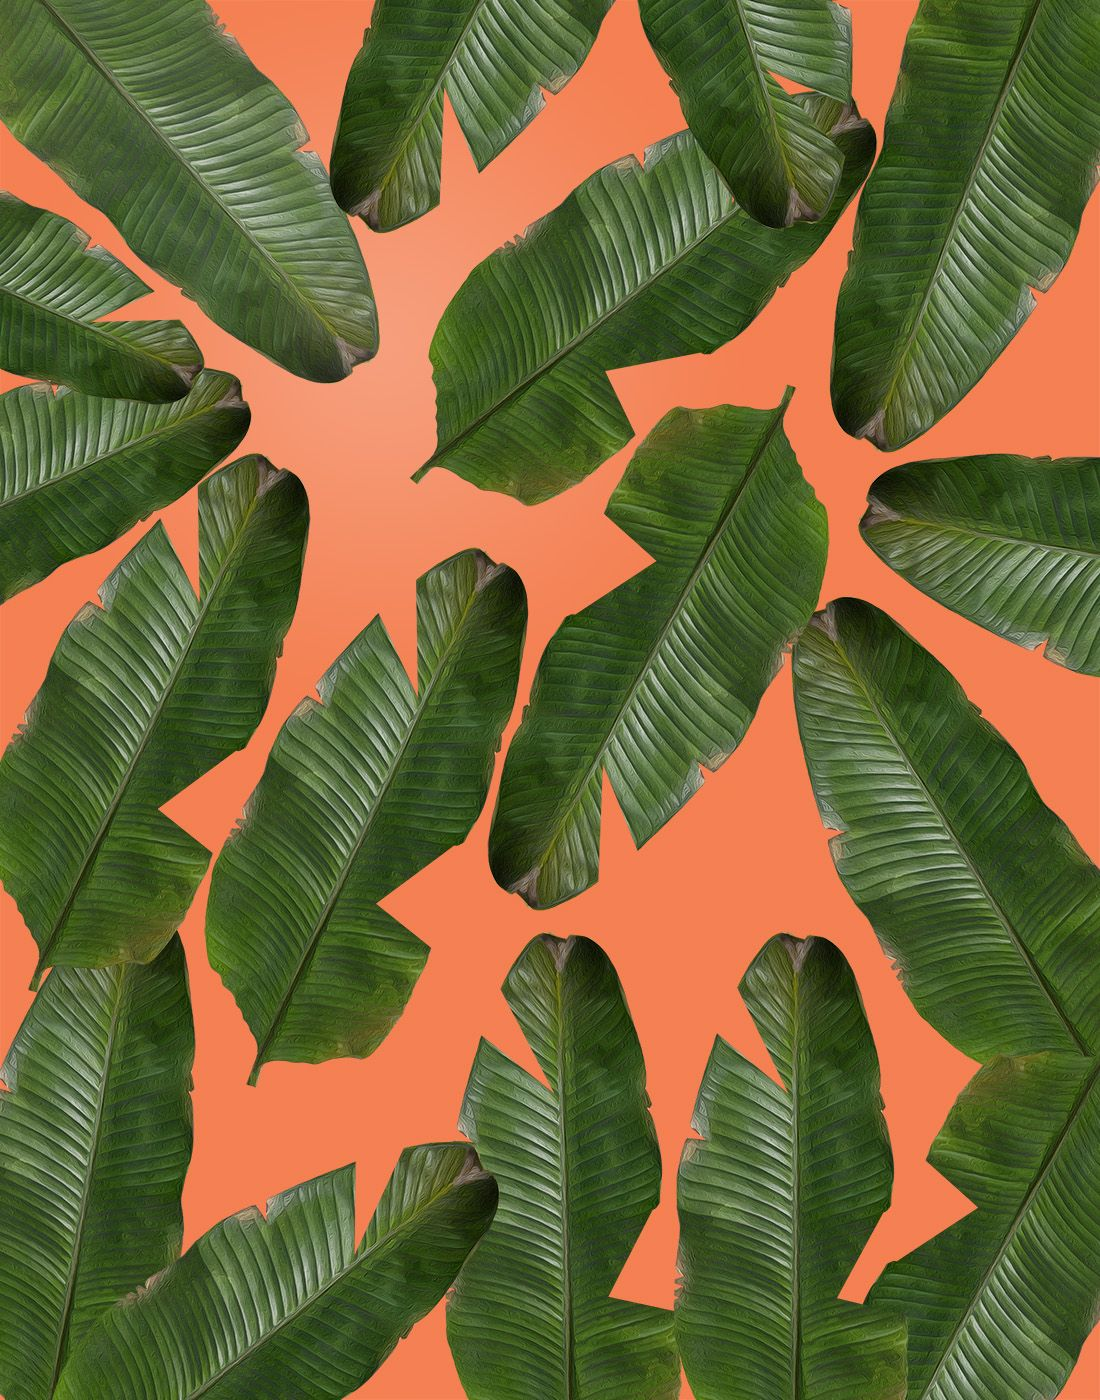 Banana Leaf Wallpaper Plant Wallpaper Banana Leaf